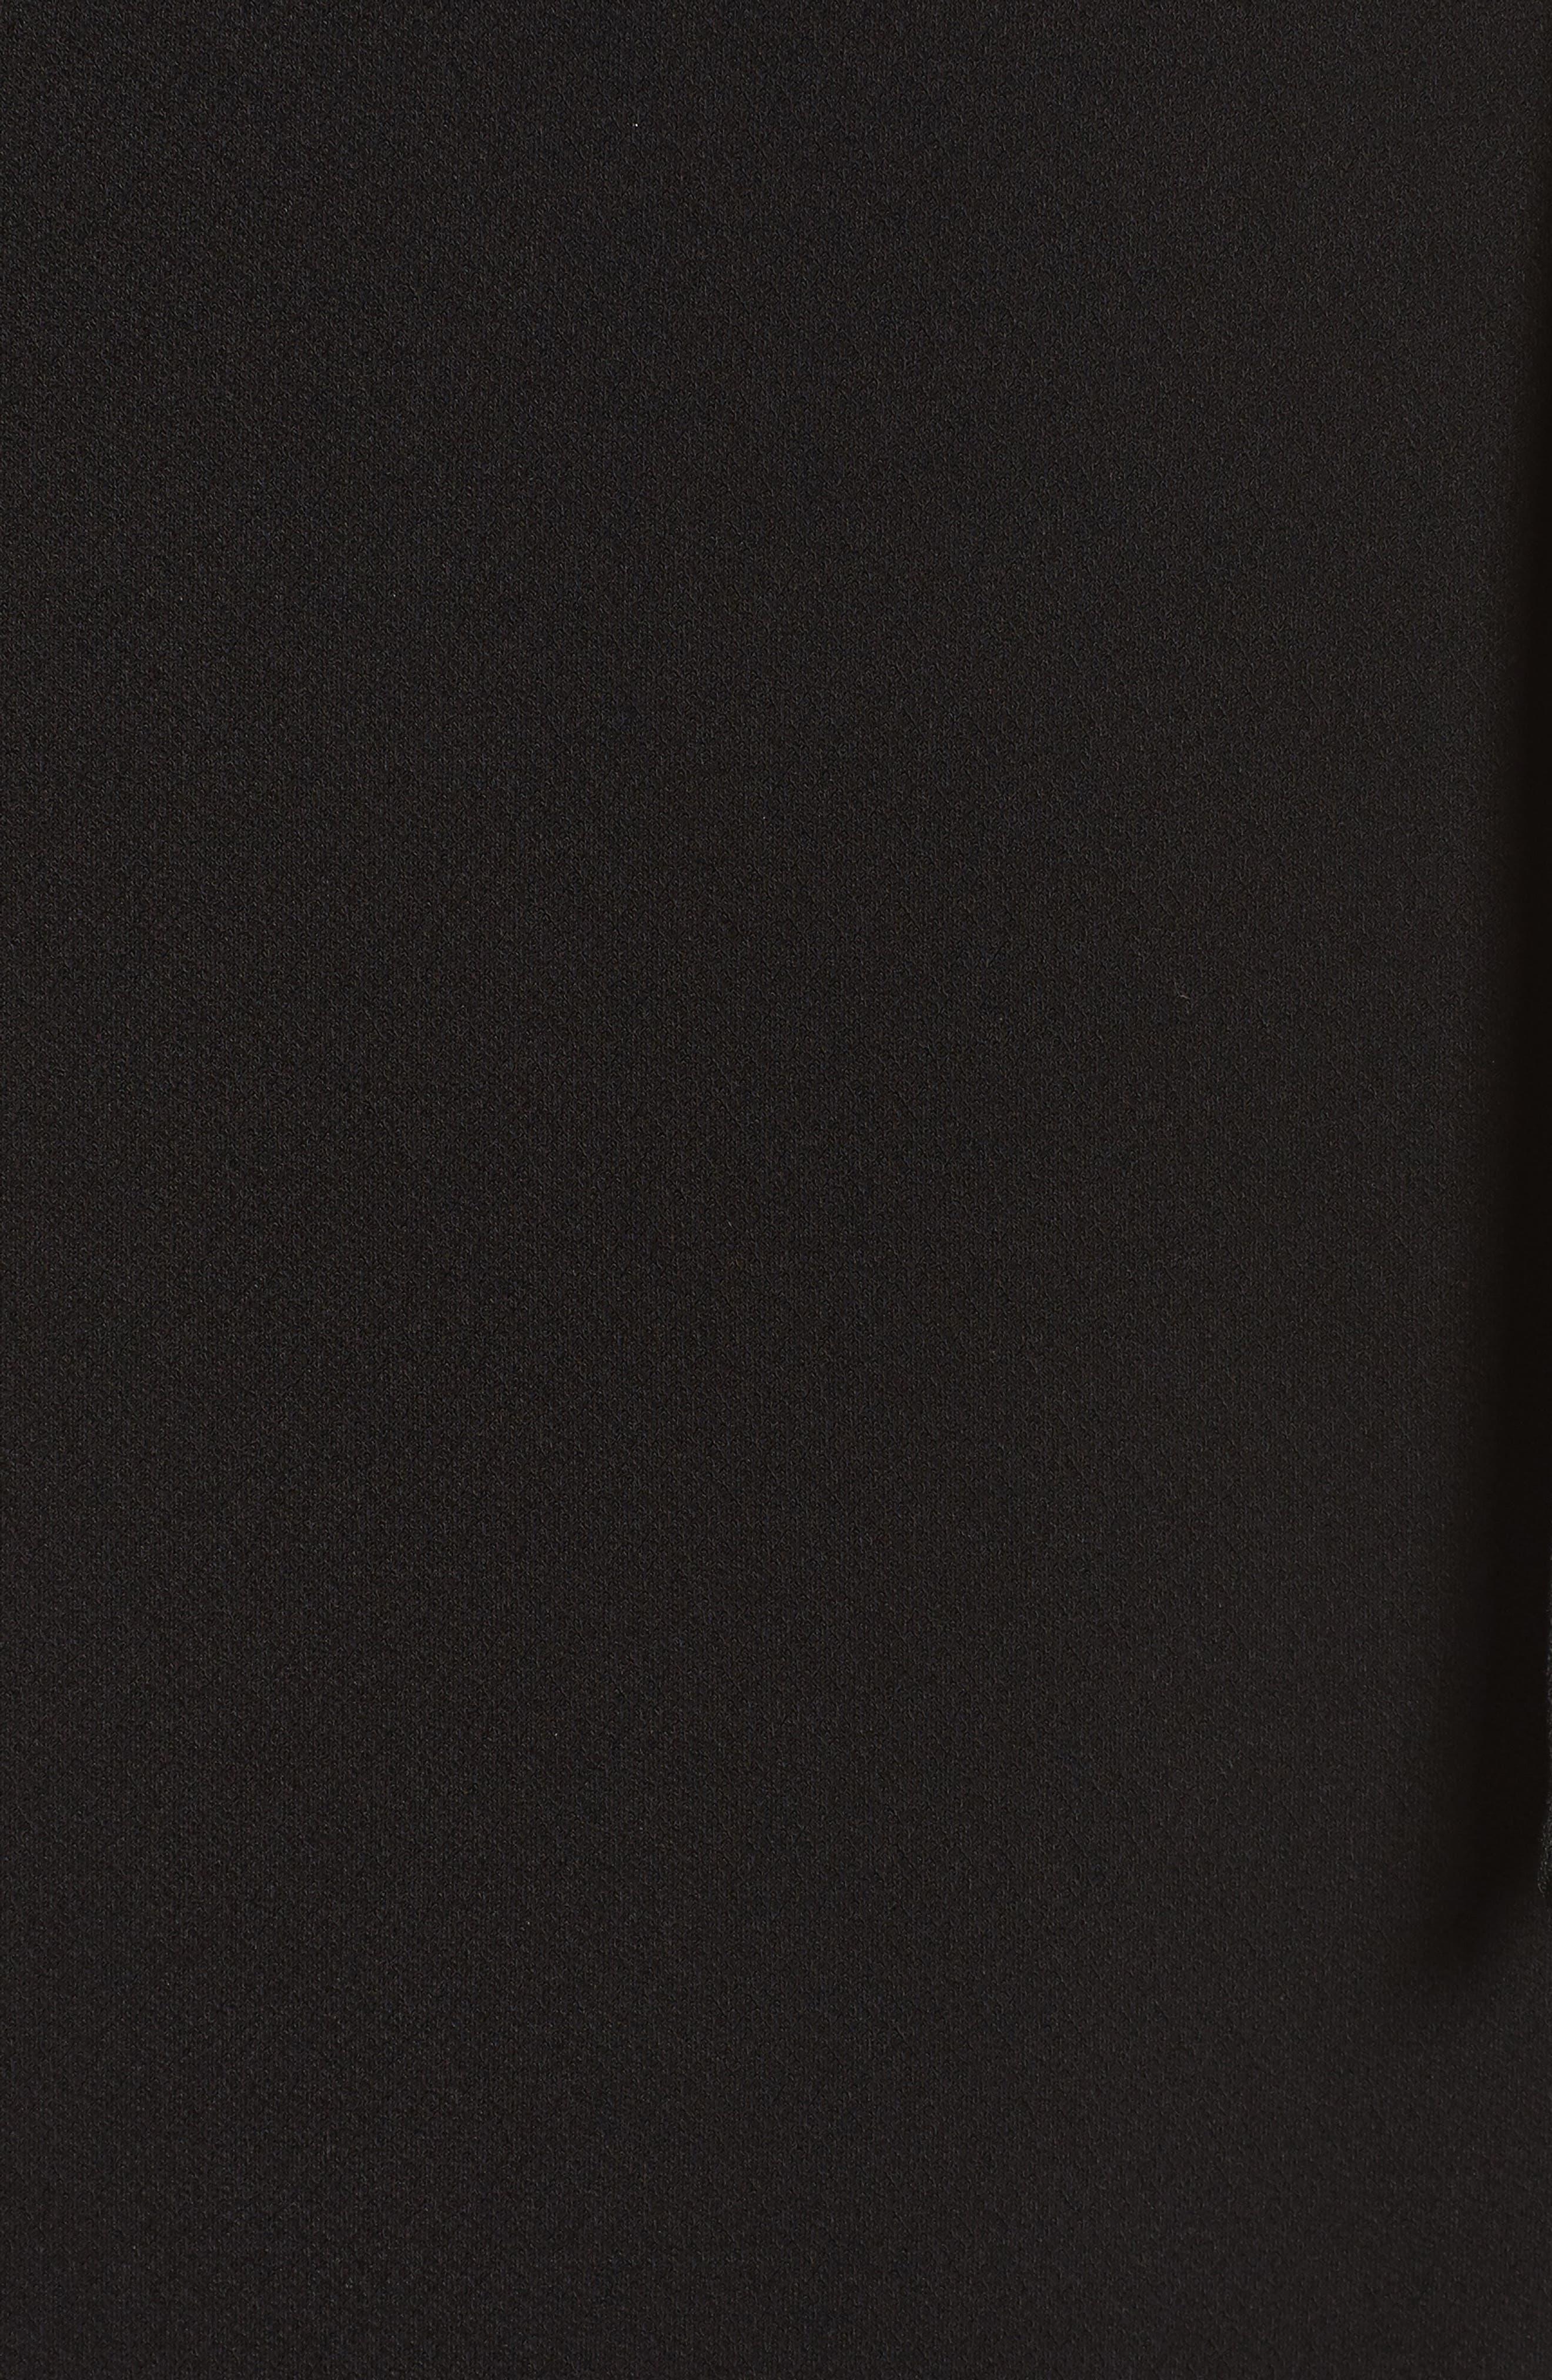 Perfect Wrap Maxi Dress,                             Alternate thumbnail 6, color,                             Black Crepe